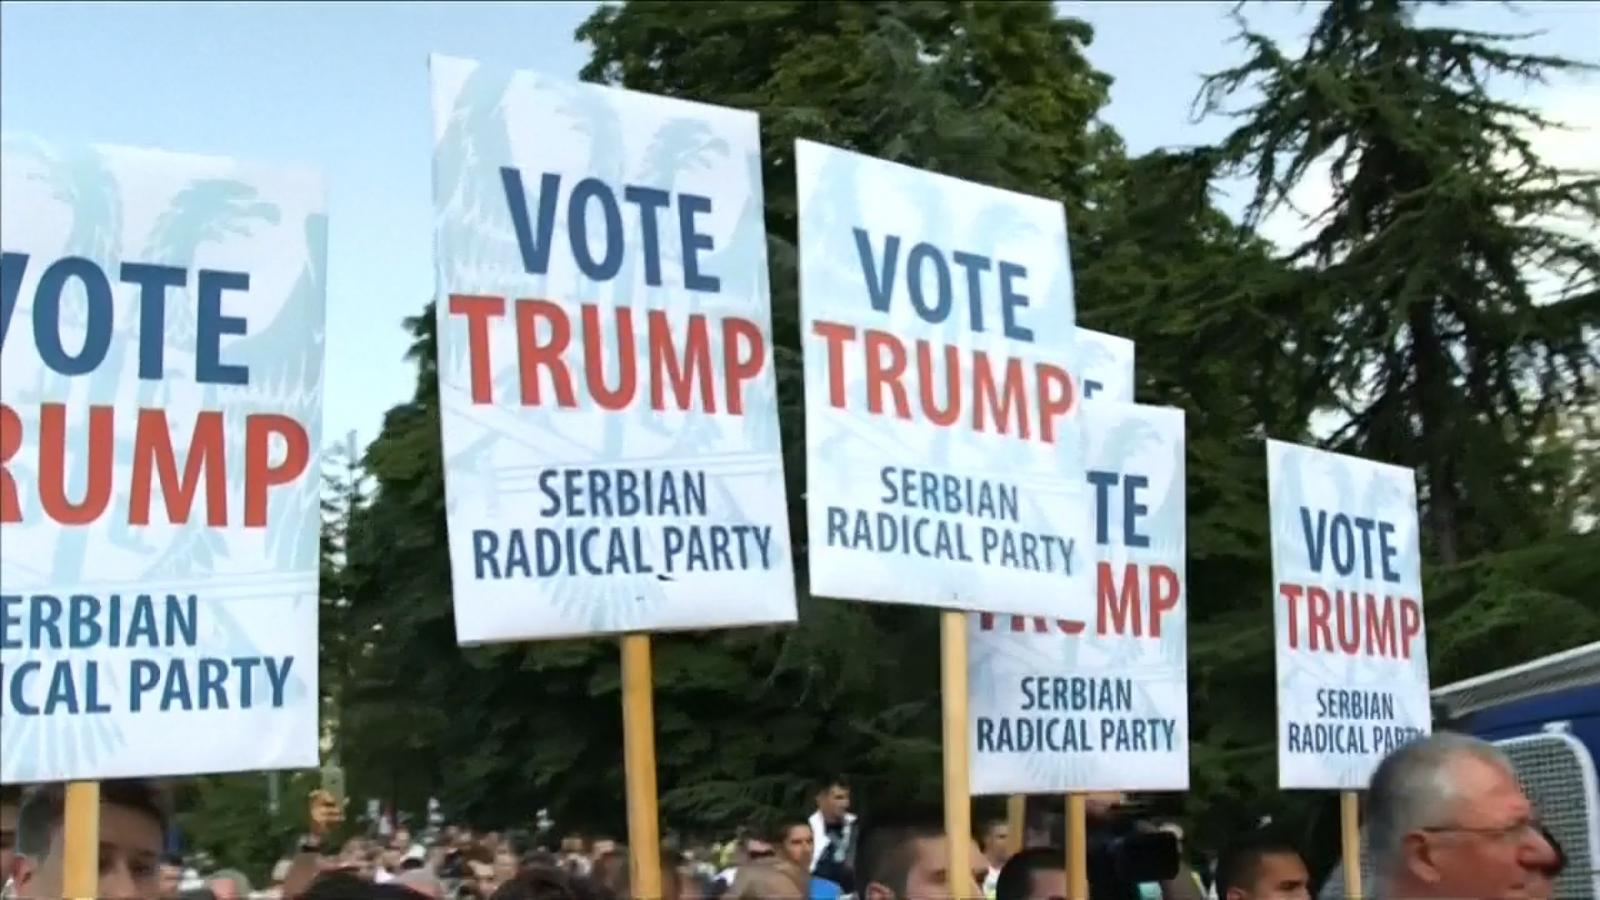 serbia-radical-party-hold-pro-donald-trump-rally-us-vice-president-joe-biden-visits-belgrade.jpg (736×442)